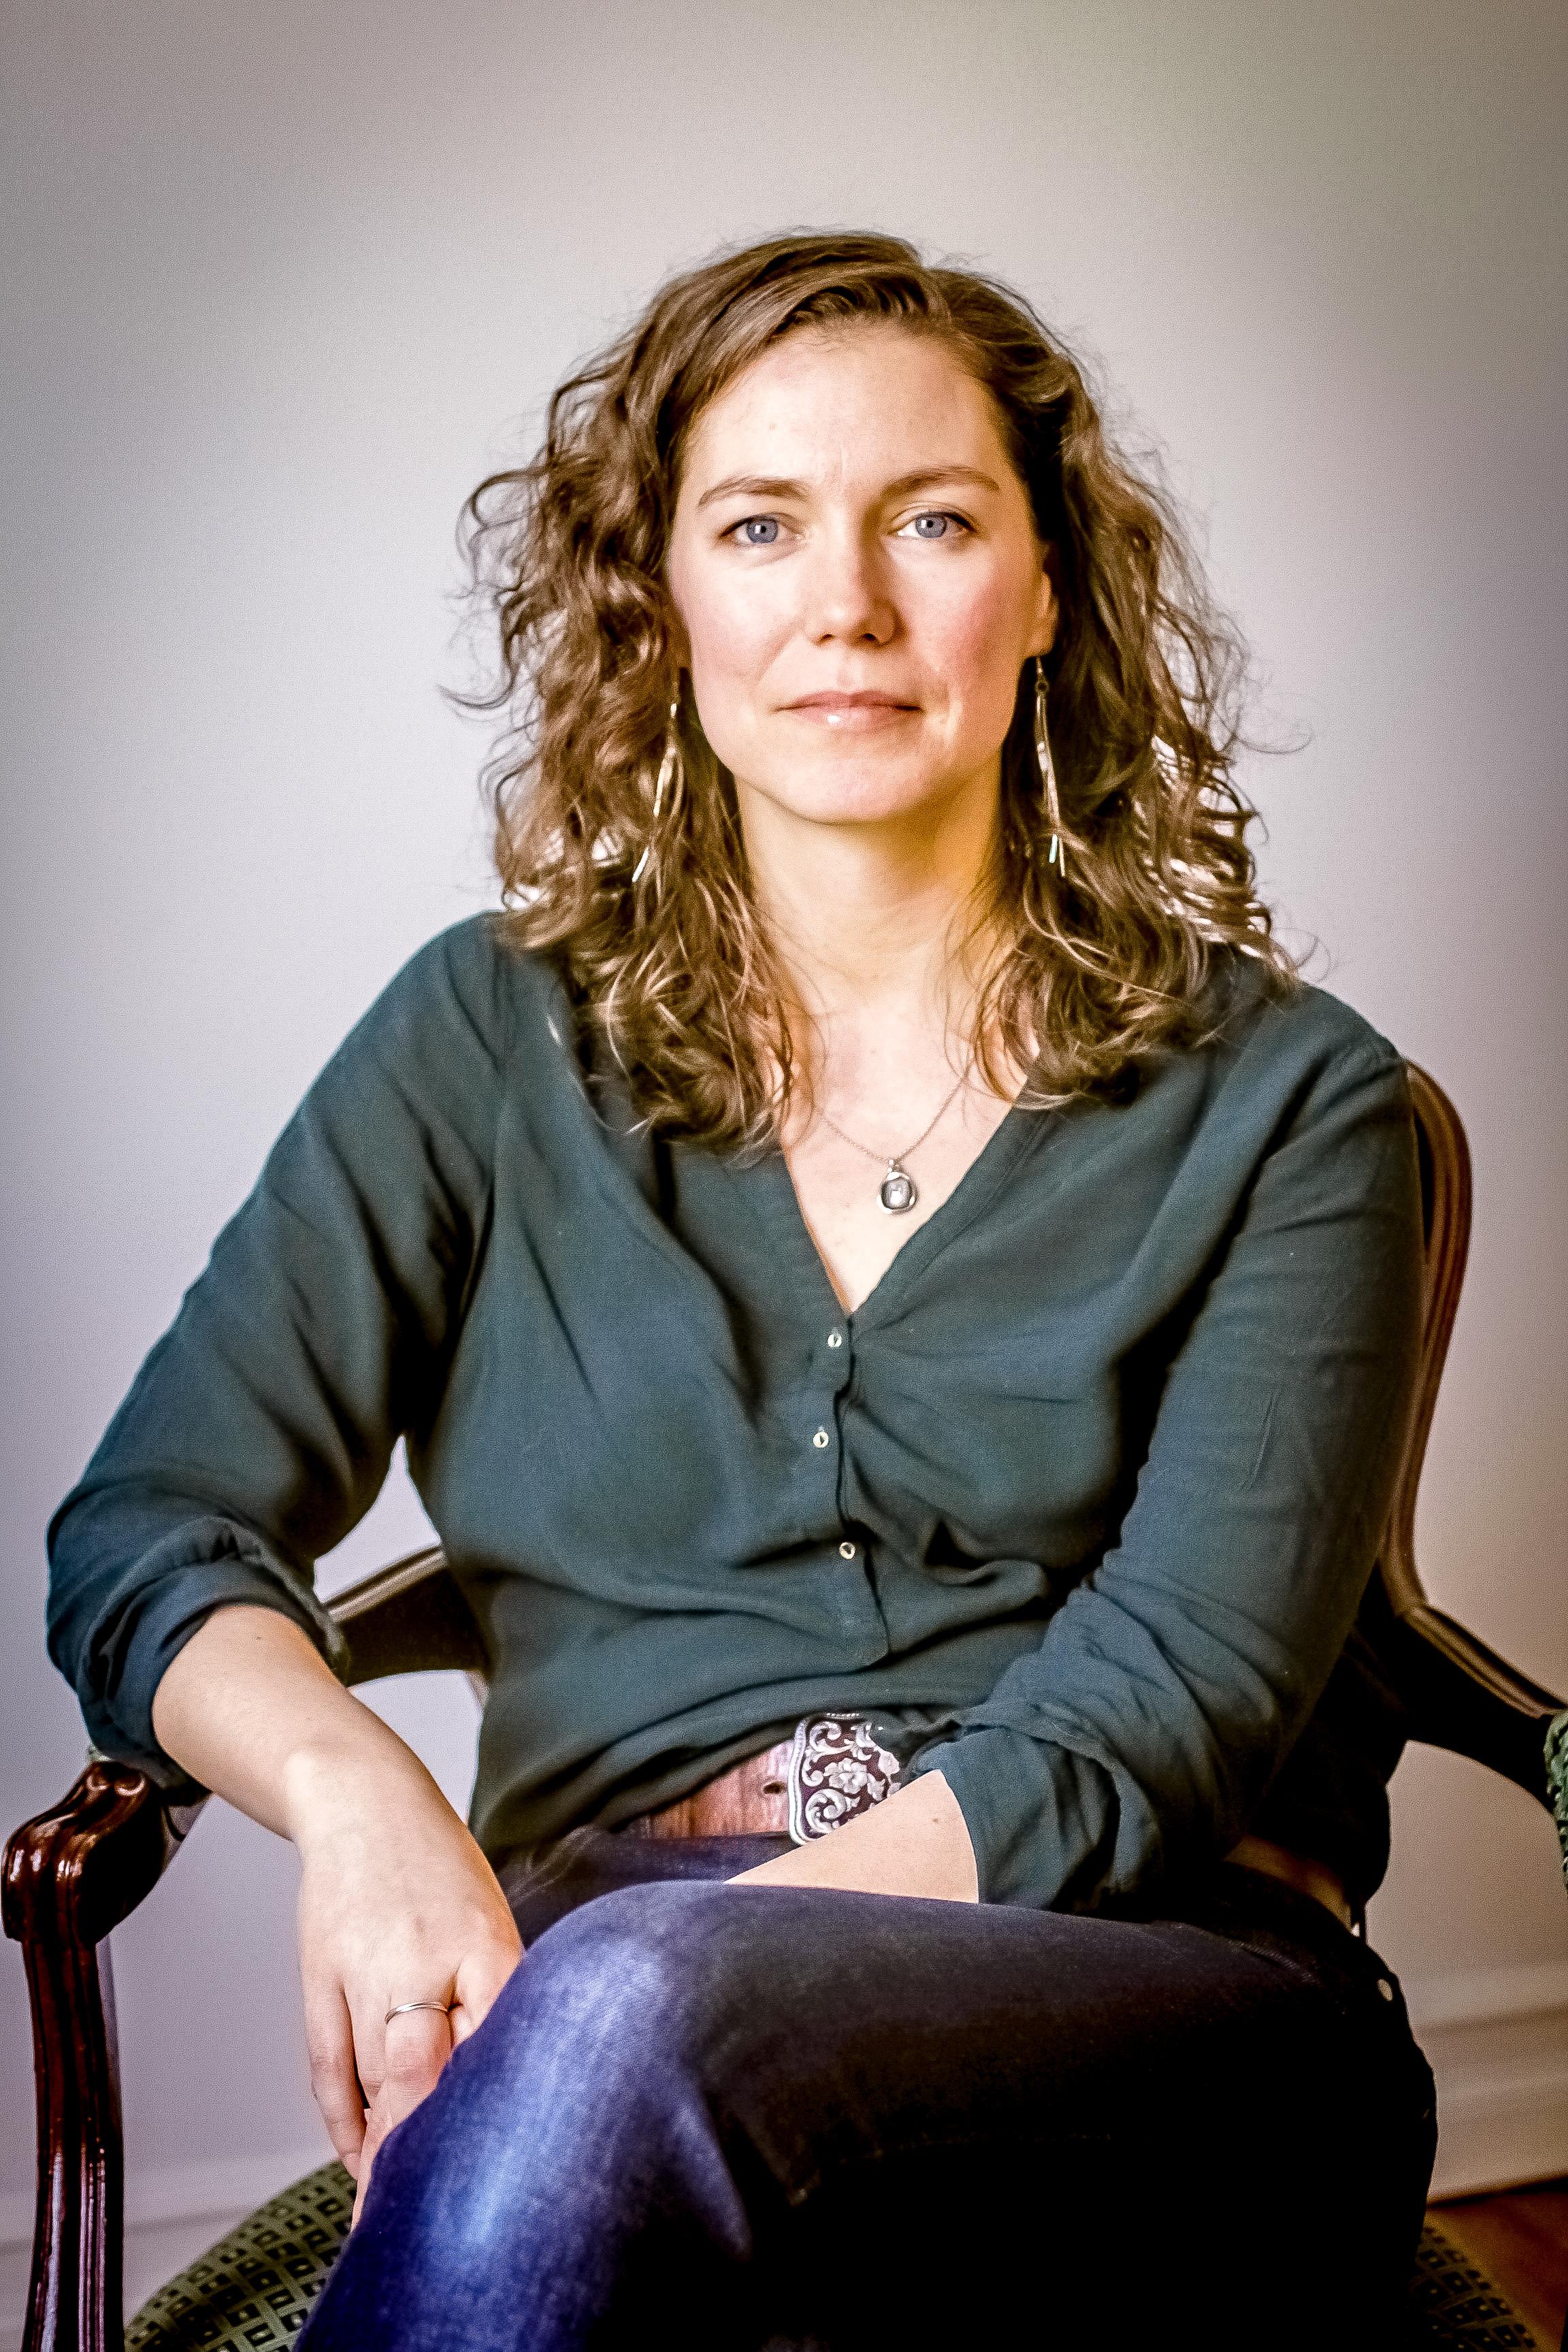 Catherine MacLellan, photo by Millefiore Clarkes